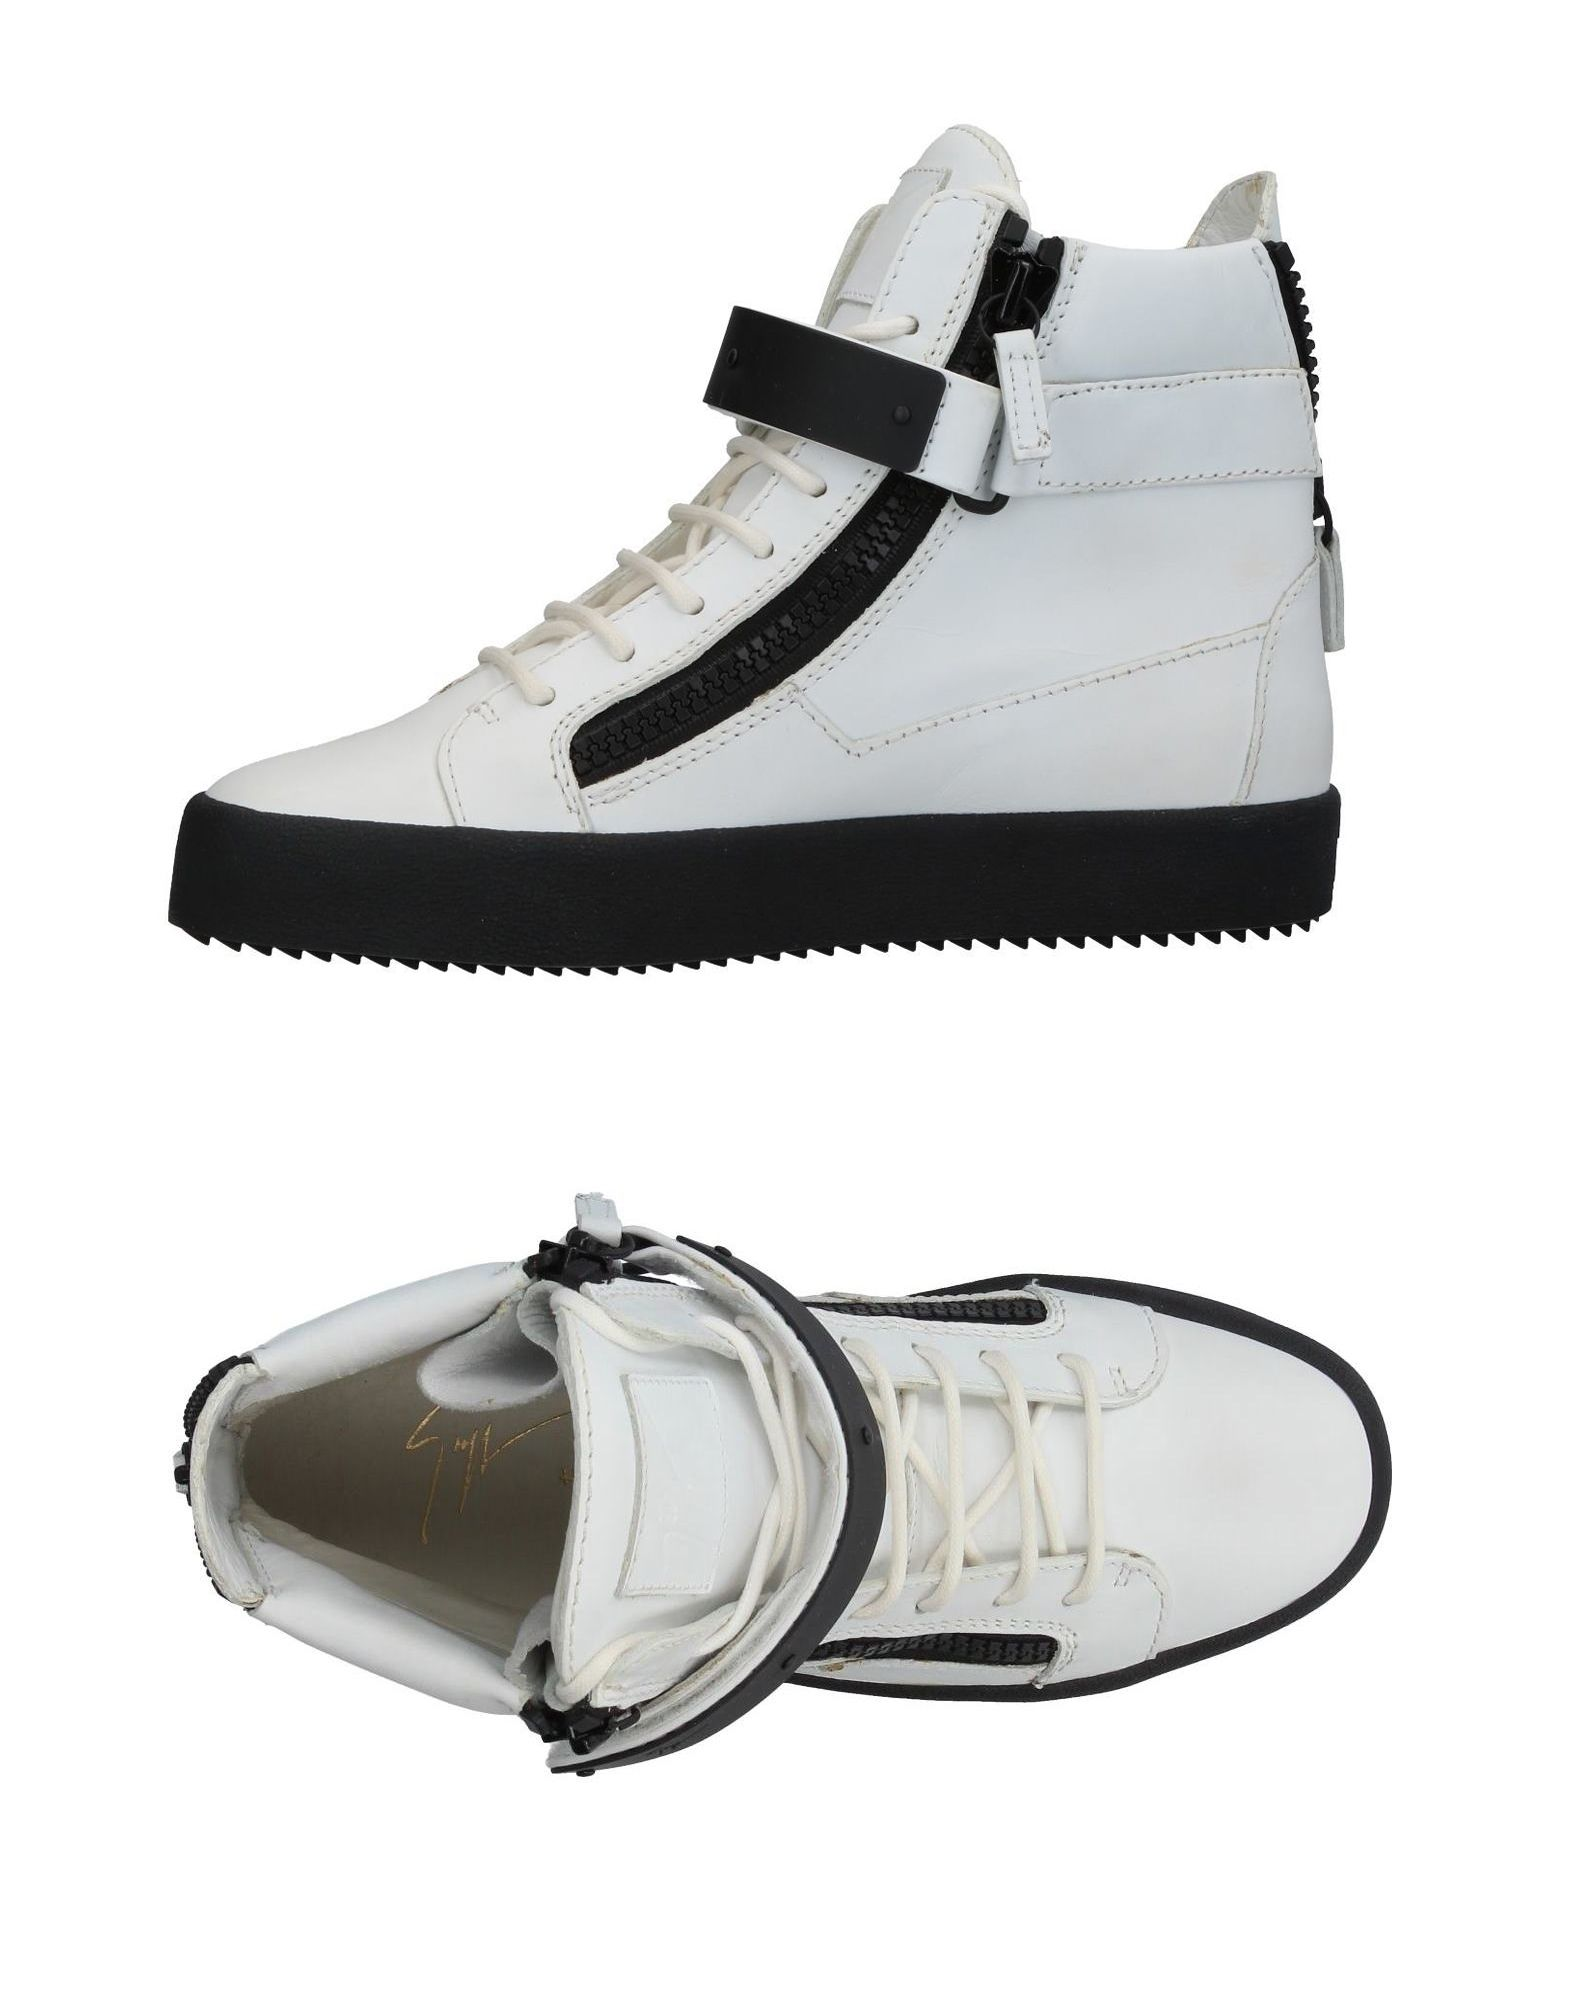 Giuseppe Zanotti Sneakers Herren  11375613IJ Gute Qualität beliebte Schuhe